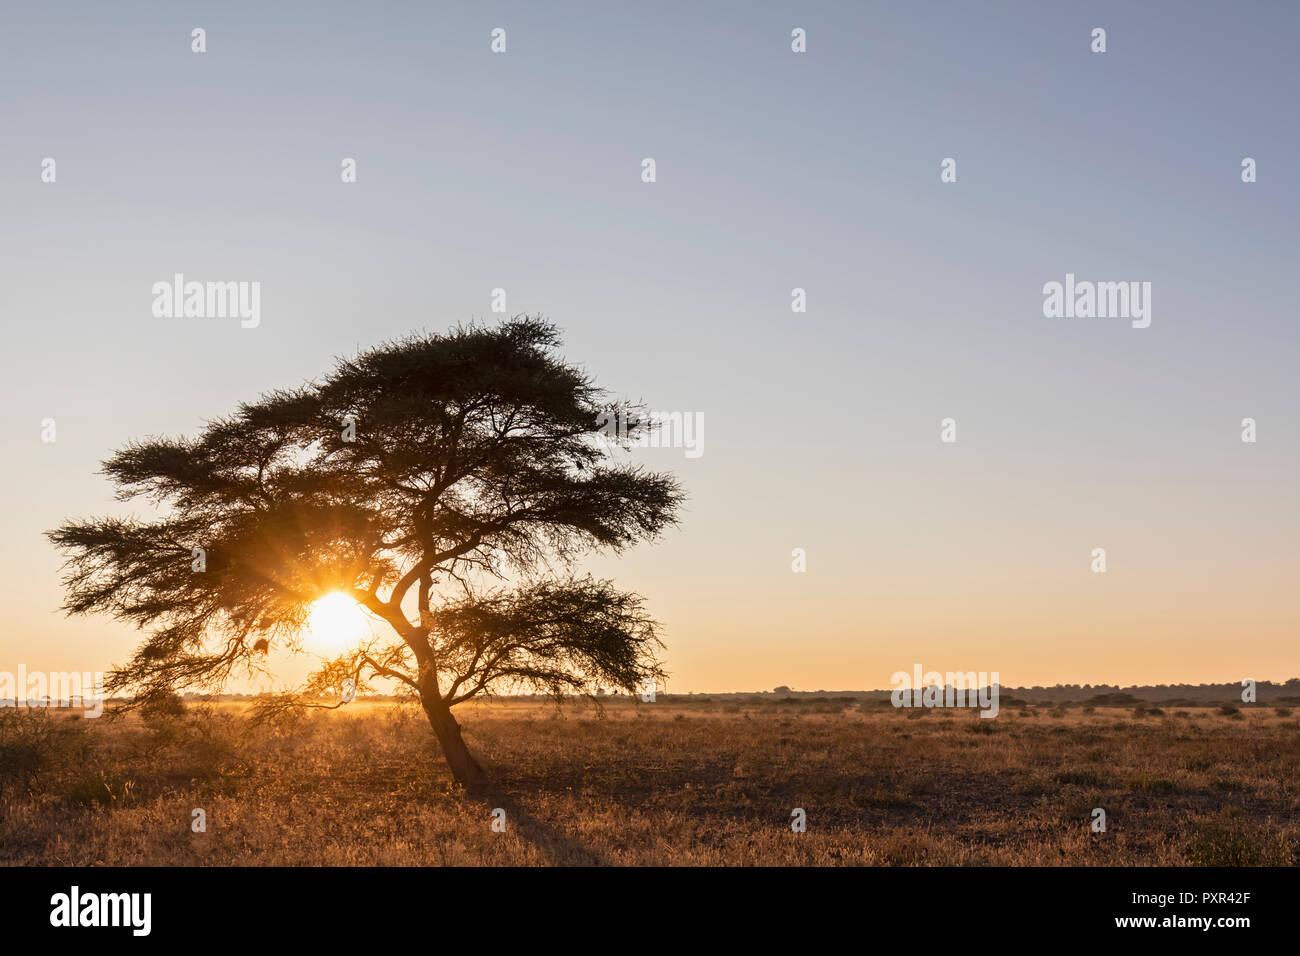 Africa, Botswana, Central Kalahari Game Reserve, Umbrella Thorn Acacia, Acacia tortilis at sunrise - Stock Image